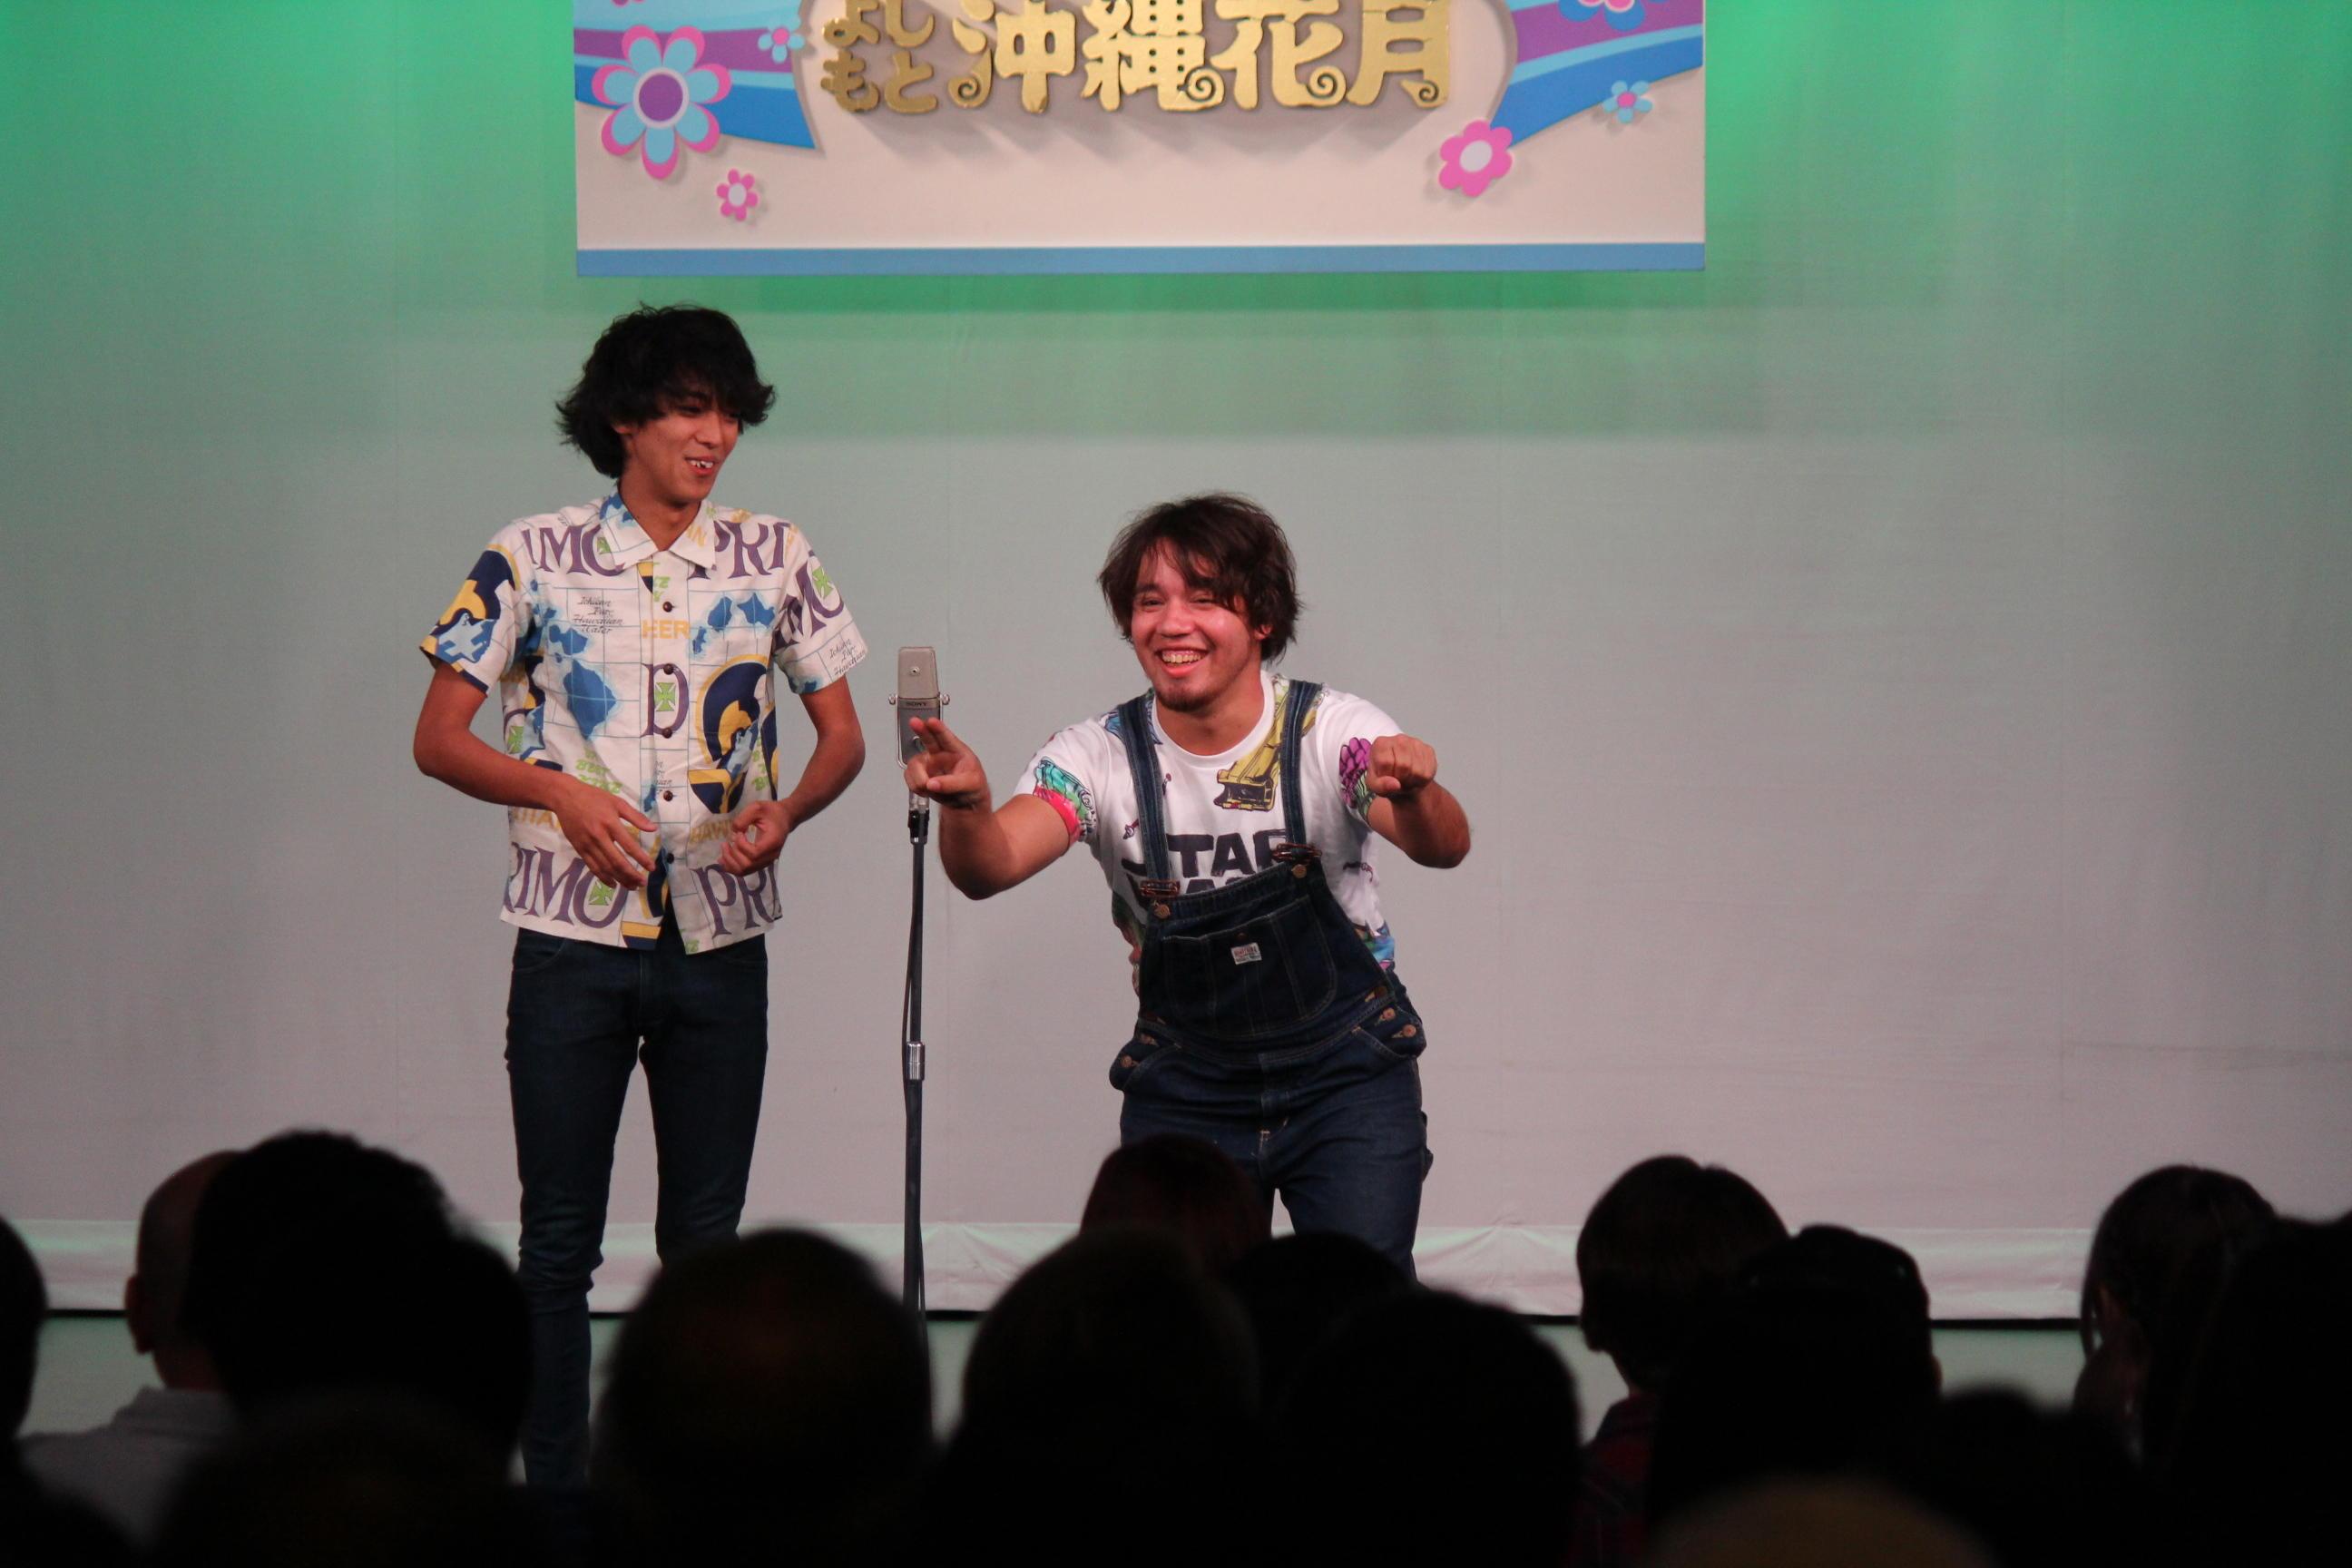 http://news.yoshimoto.co.jp/20151201134407-1fe6c310a15863cf7f3f307b9c96bb02b6aaba8d.jpg